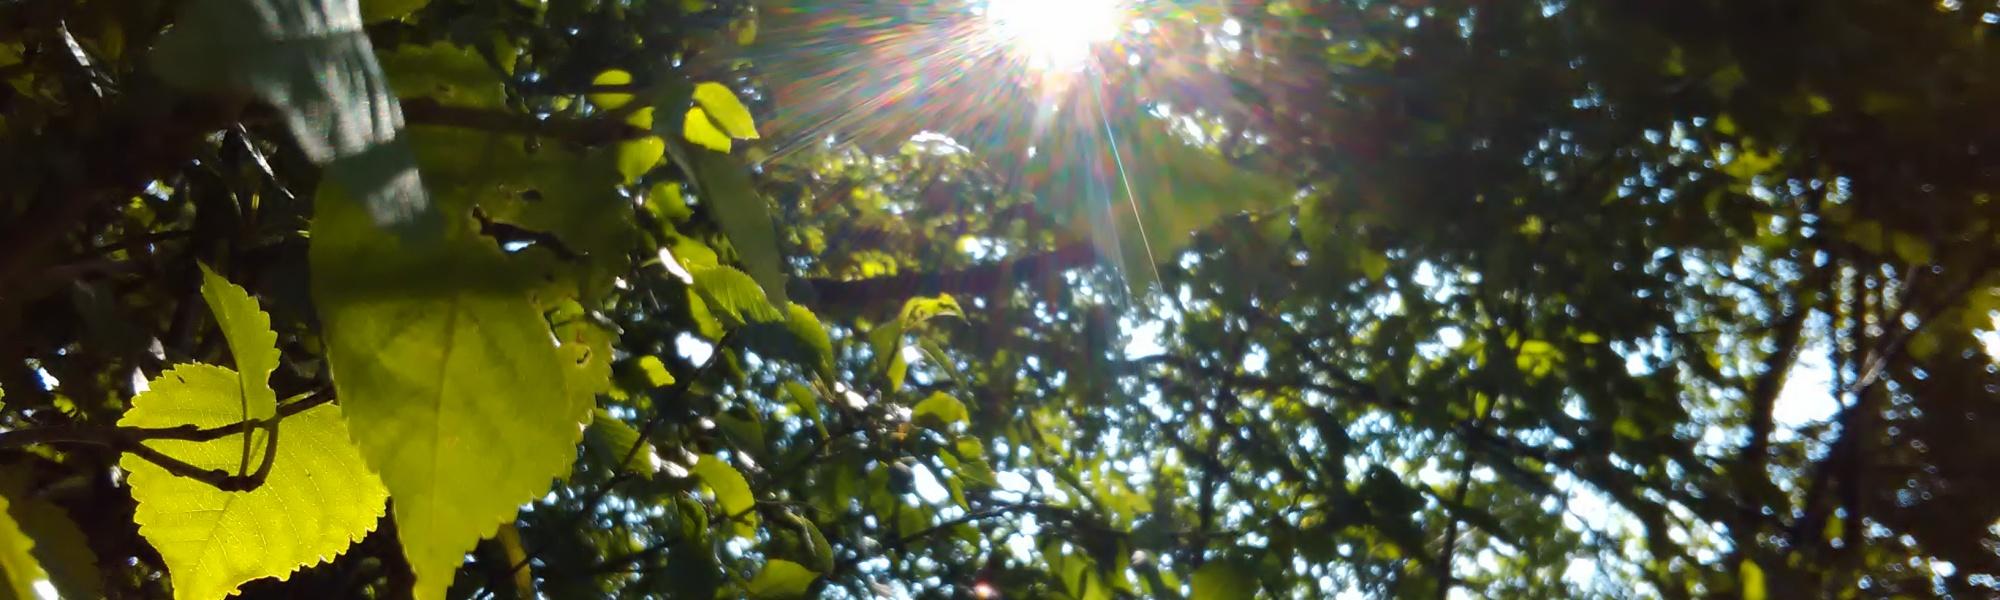 Blätterdach-Sonne